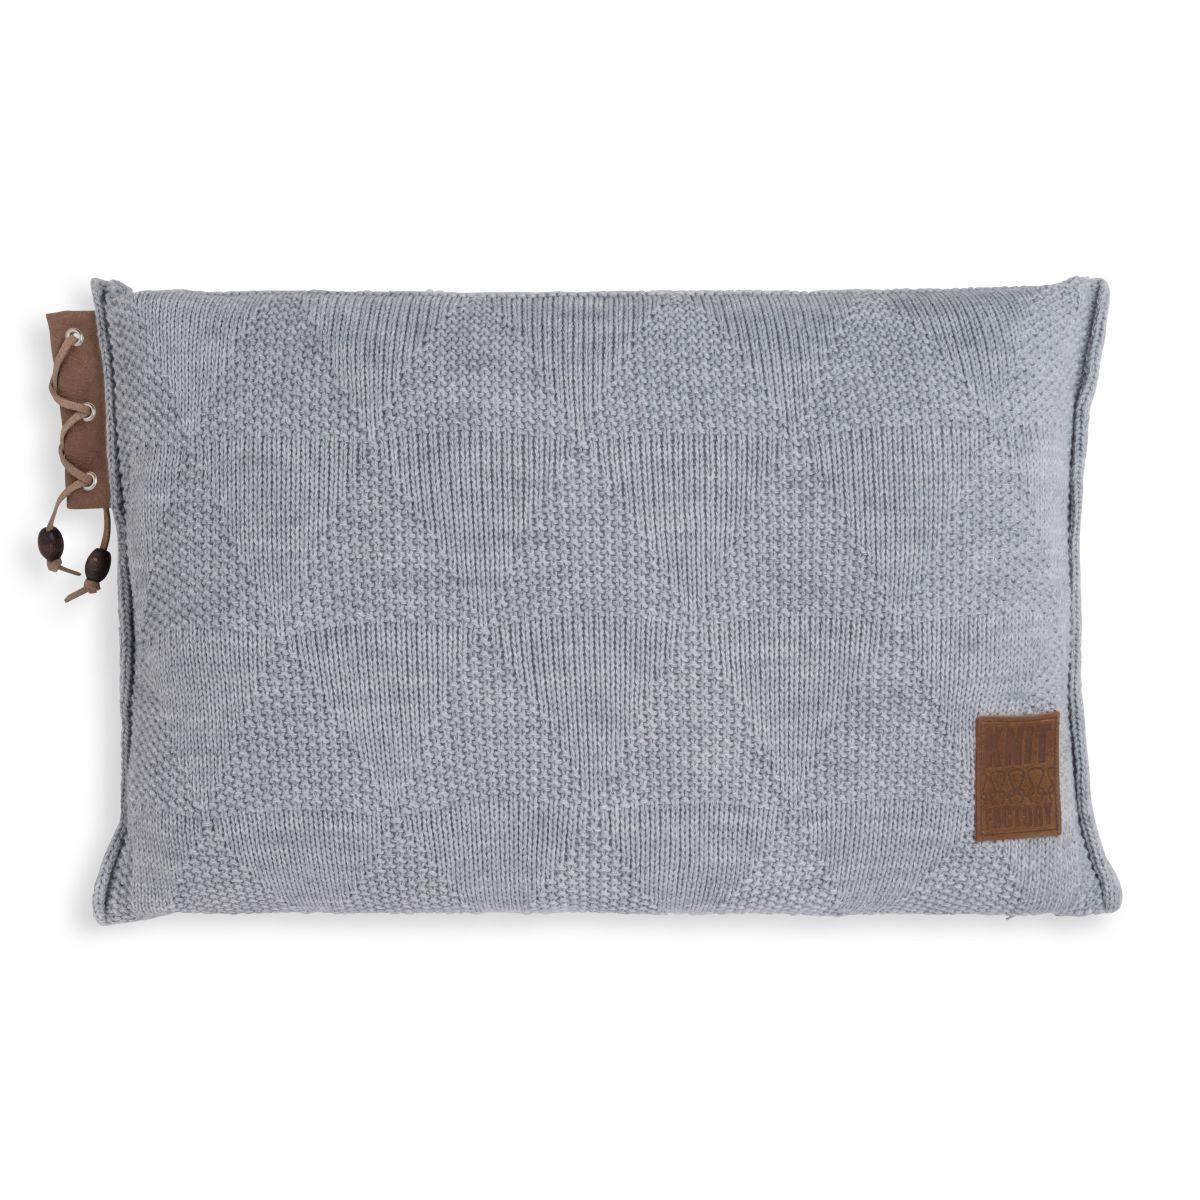 jay cushion light grey 60x40